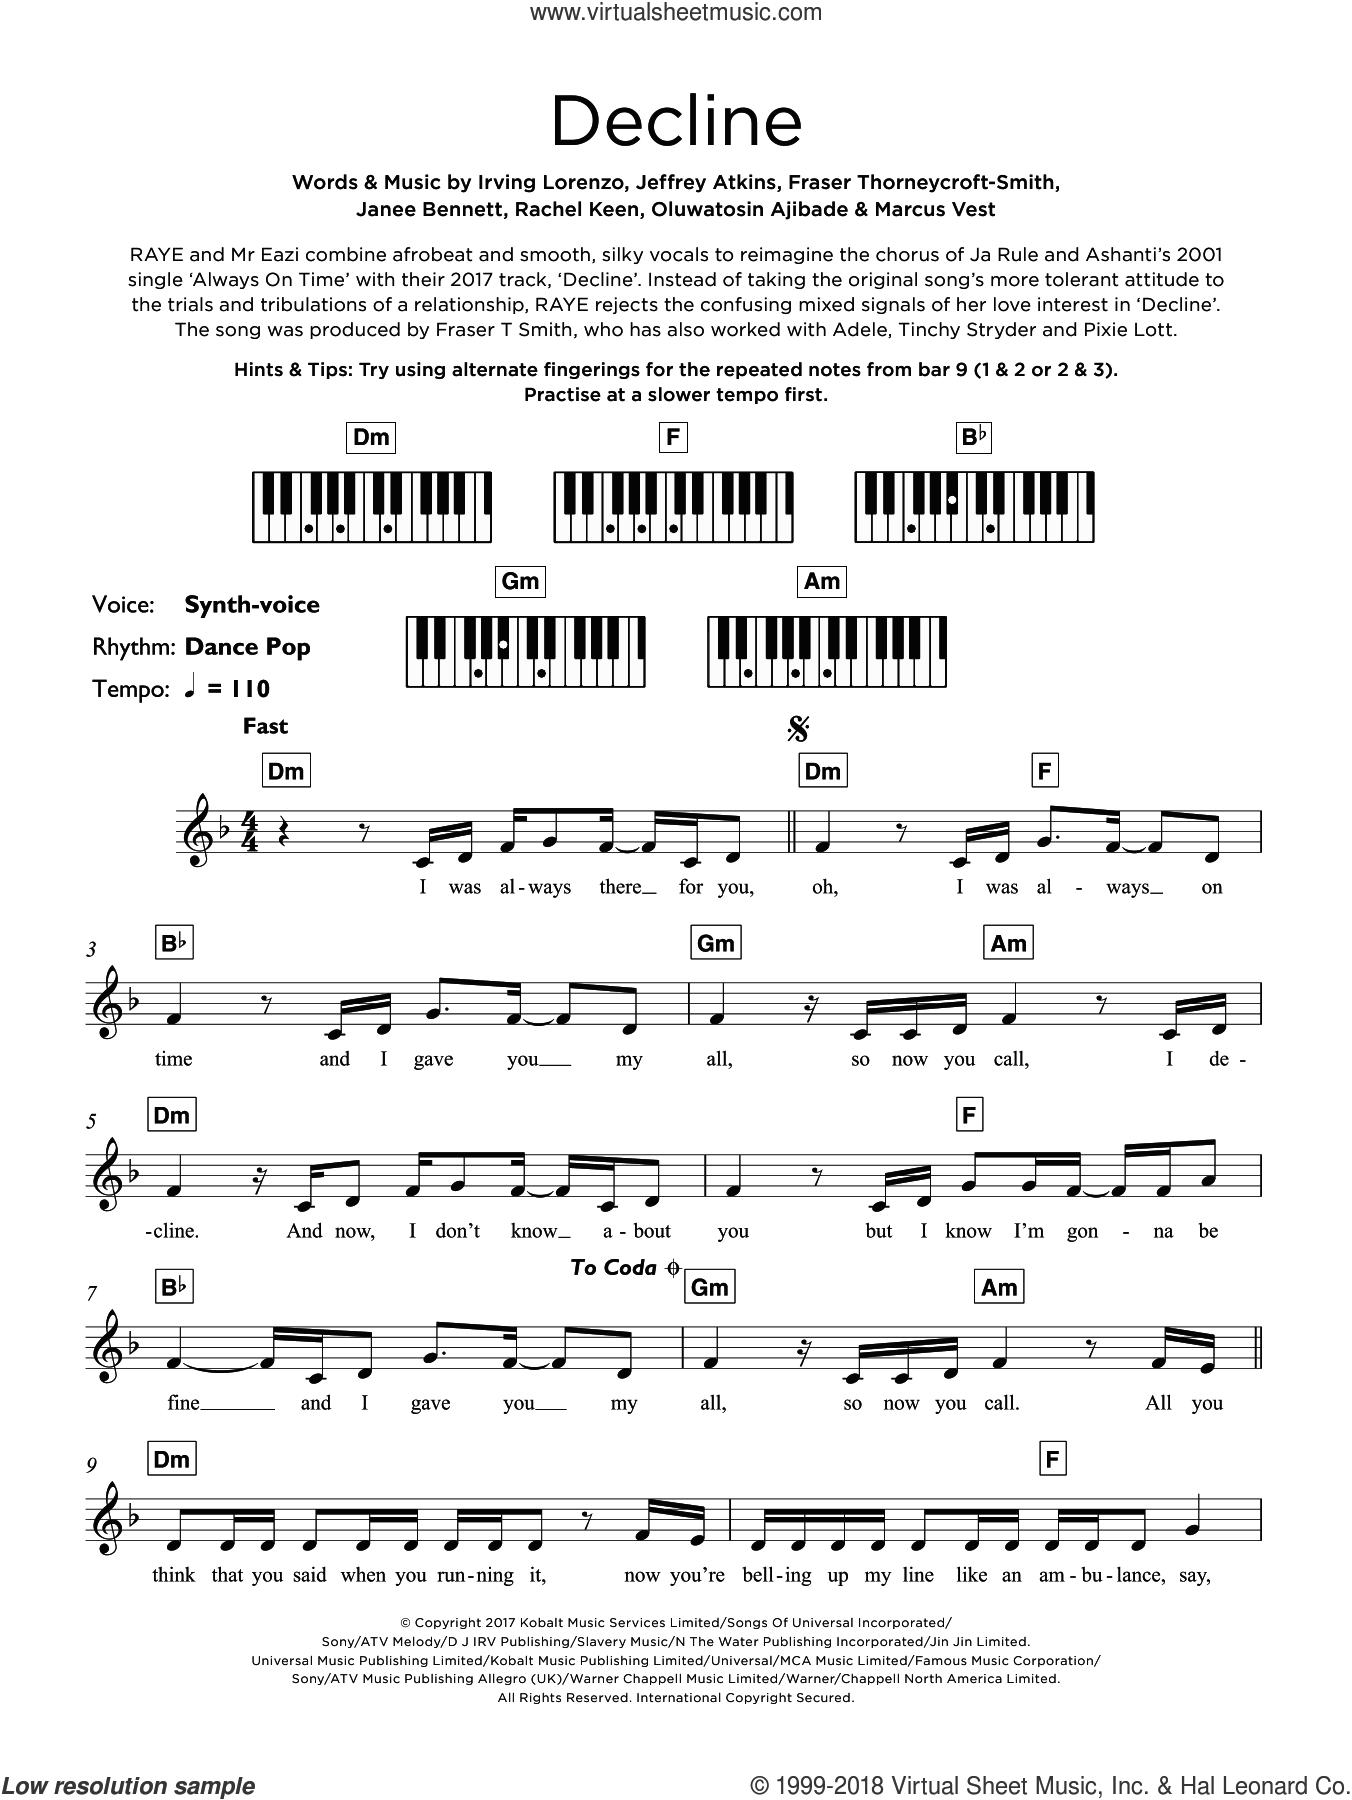 Decline sheet music for piano solo (keyboard) by Jeffrey Atkins, Don Raye, Mr Eazi, Fraser Thorneycroft-Smith, Irving Lorenzo, Janee Bennett, Marcus Vest, Oluwatosin Ajibade and Rachel Keen, intermediate piano (keyboard)